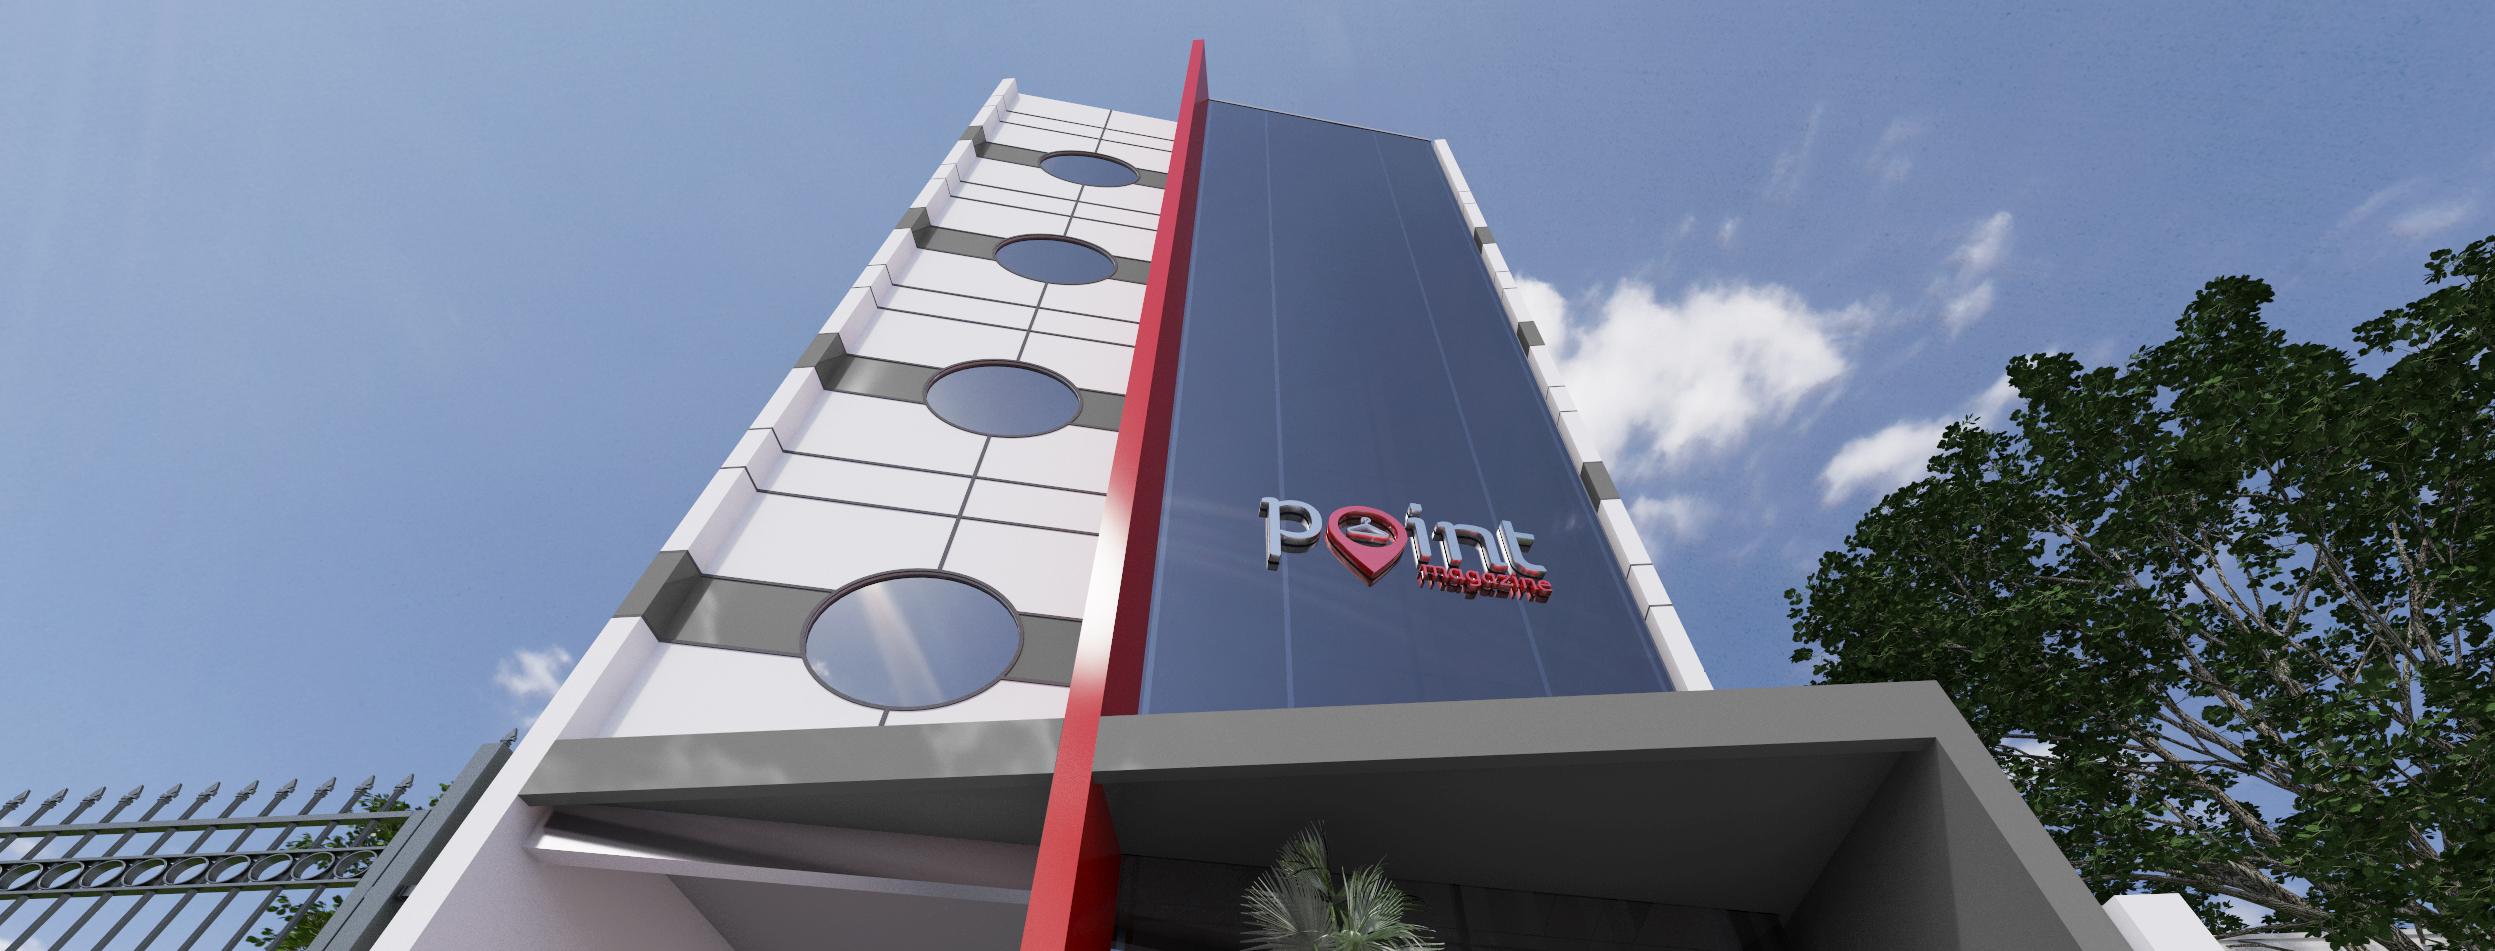 Loja Point Magazine (filial)